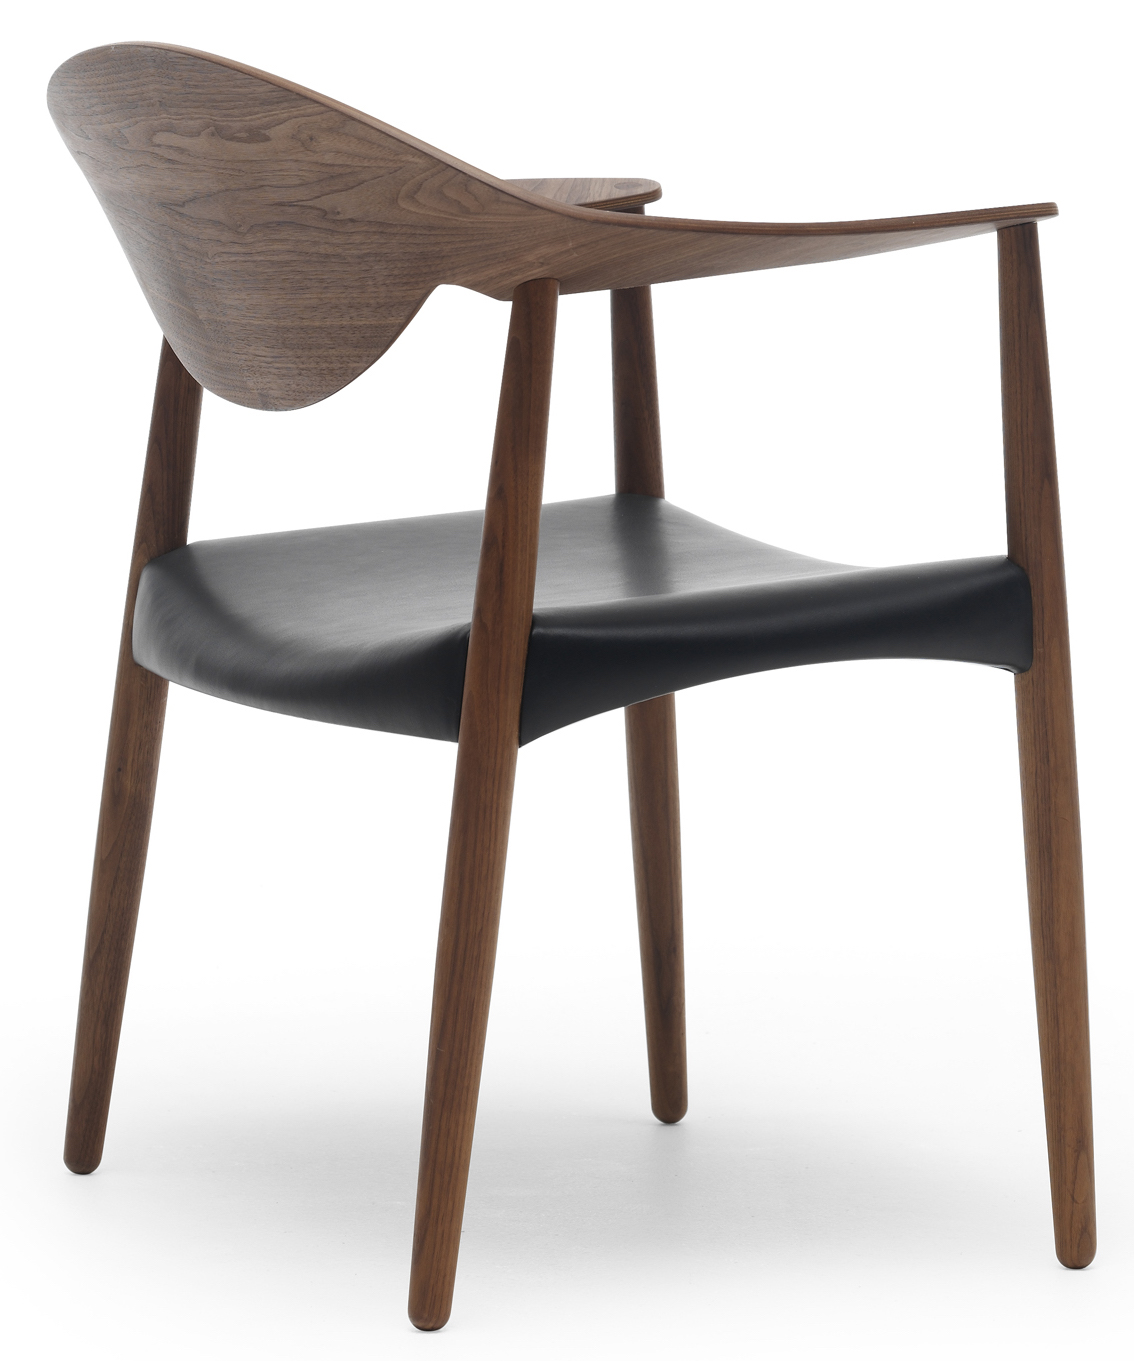 Metropolitan Chair with Wooden back Carl Hansen & Son